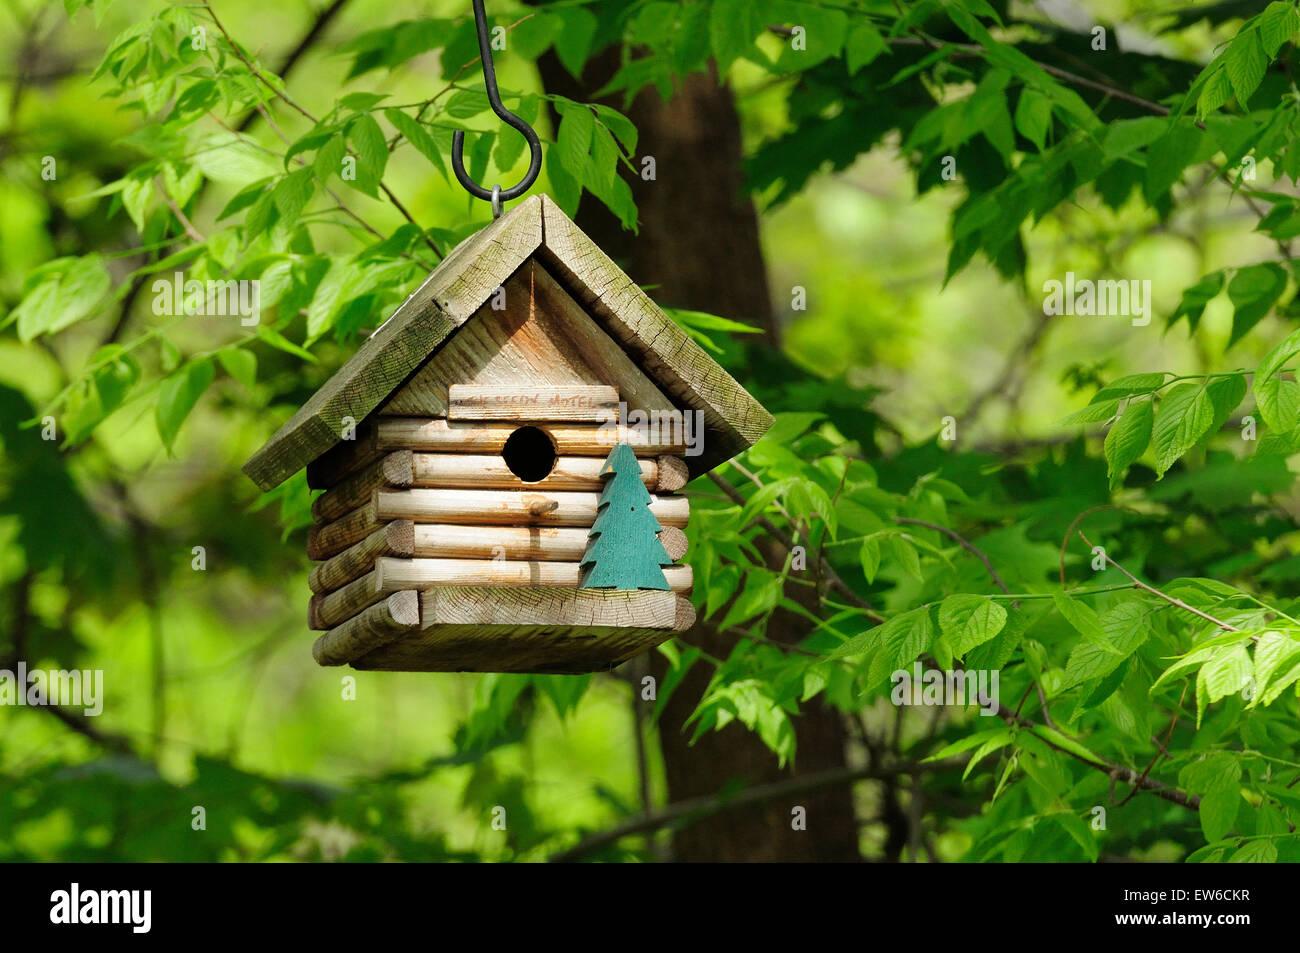 'The Seedy Motel' log cabin bird house. - Stock Image